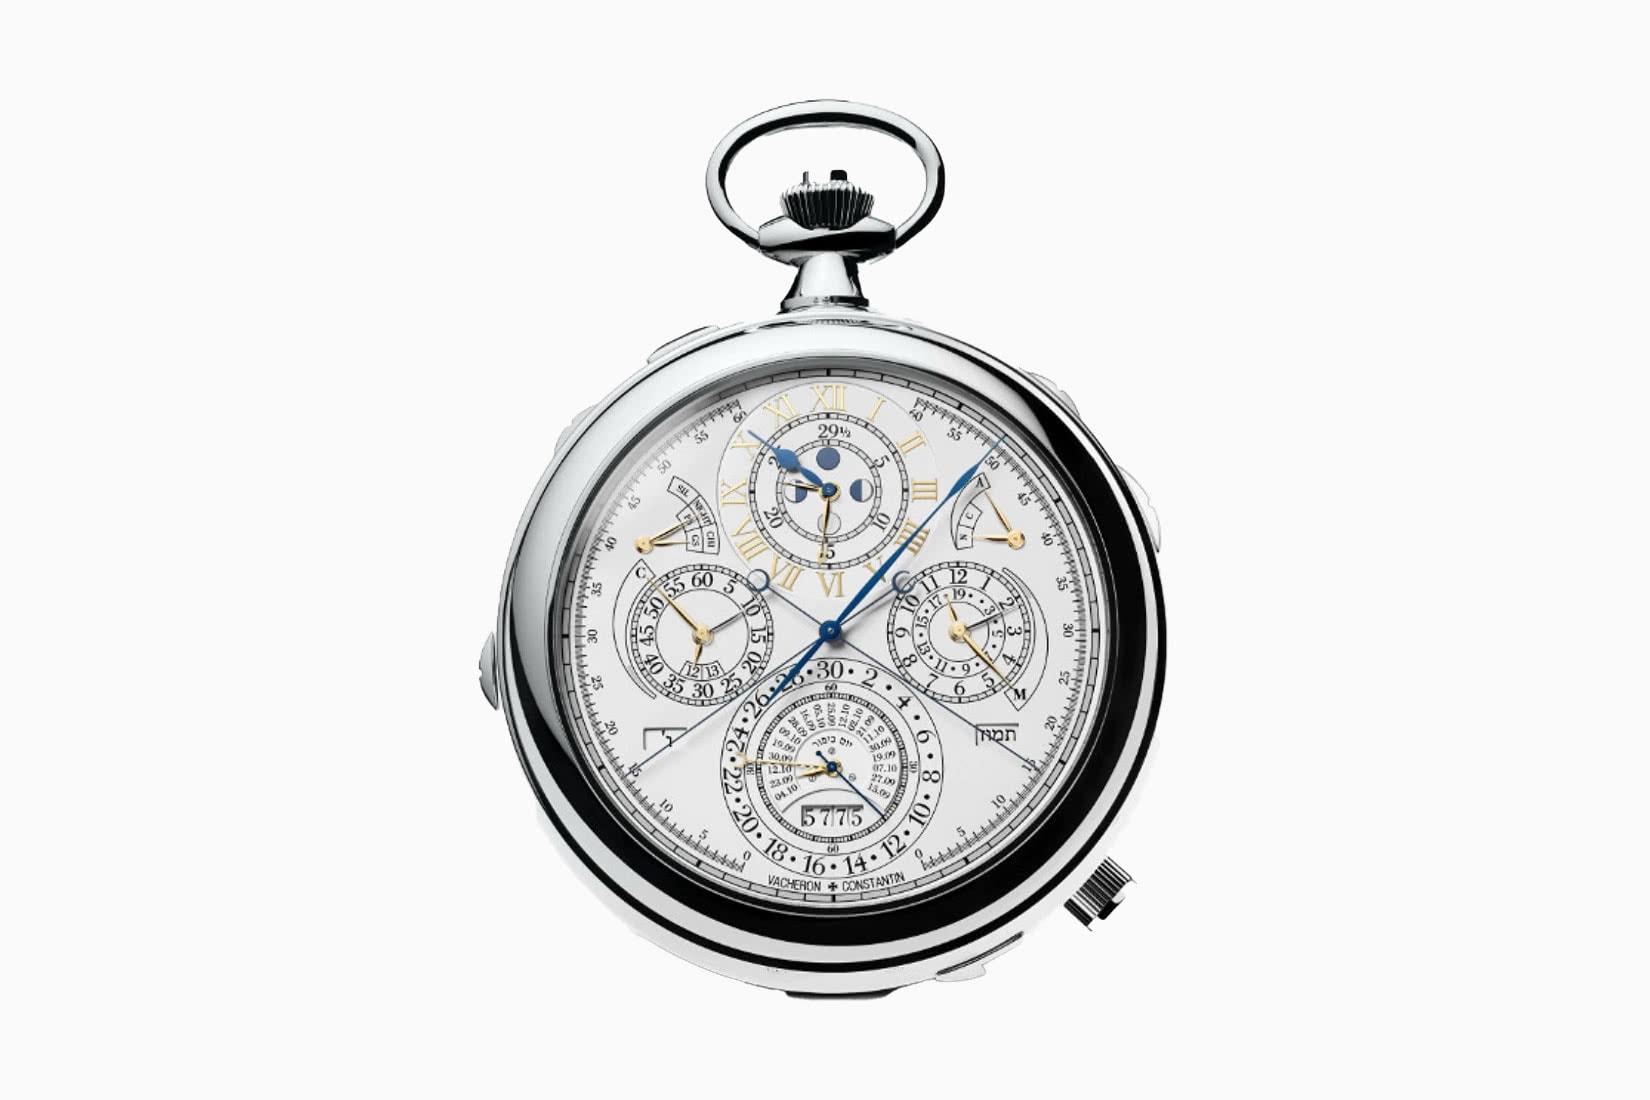 most expensive watches vacheron constantin 57260 - Luxe Digital